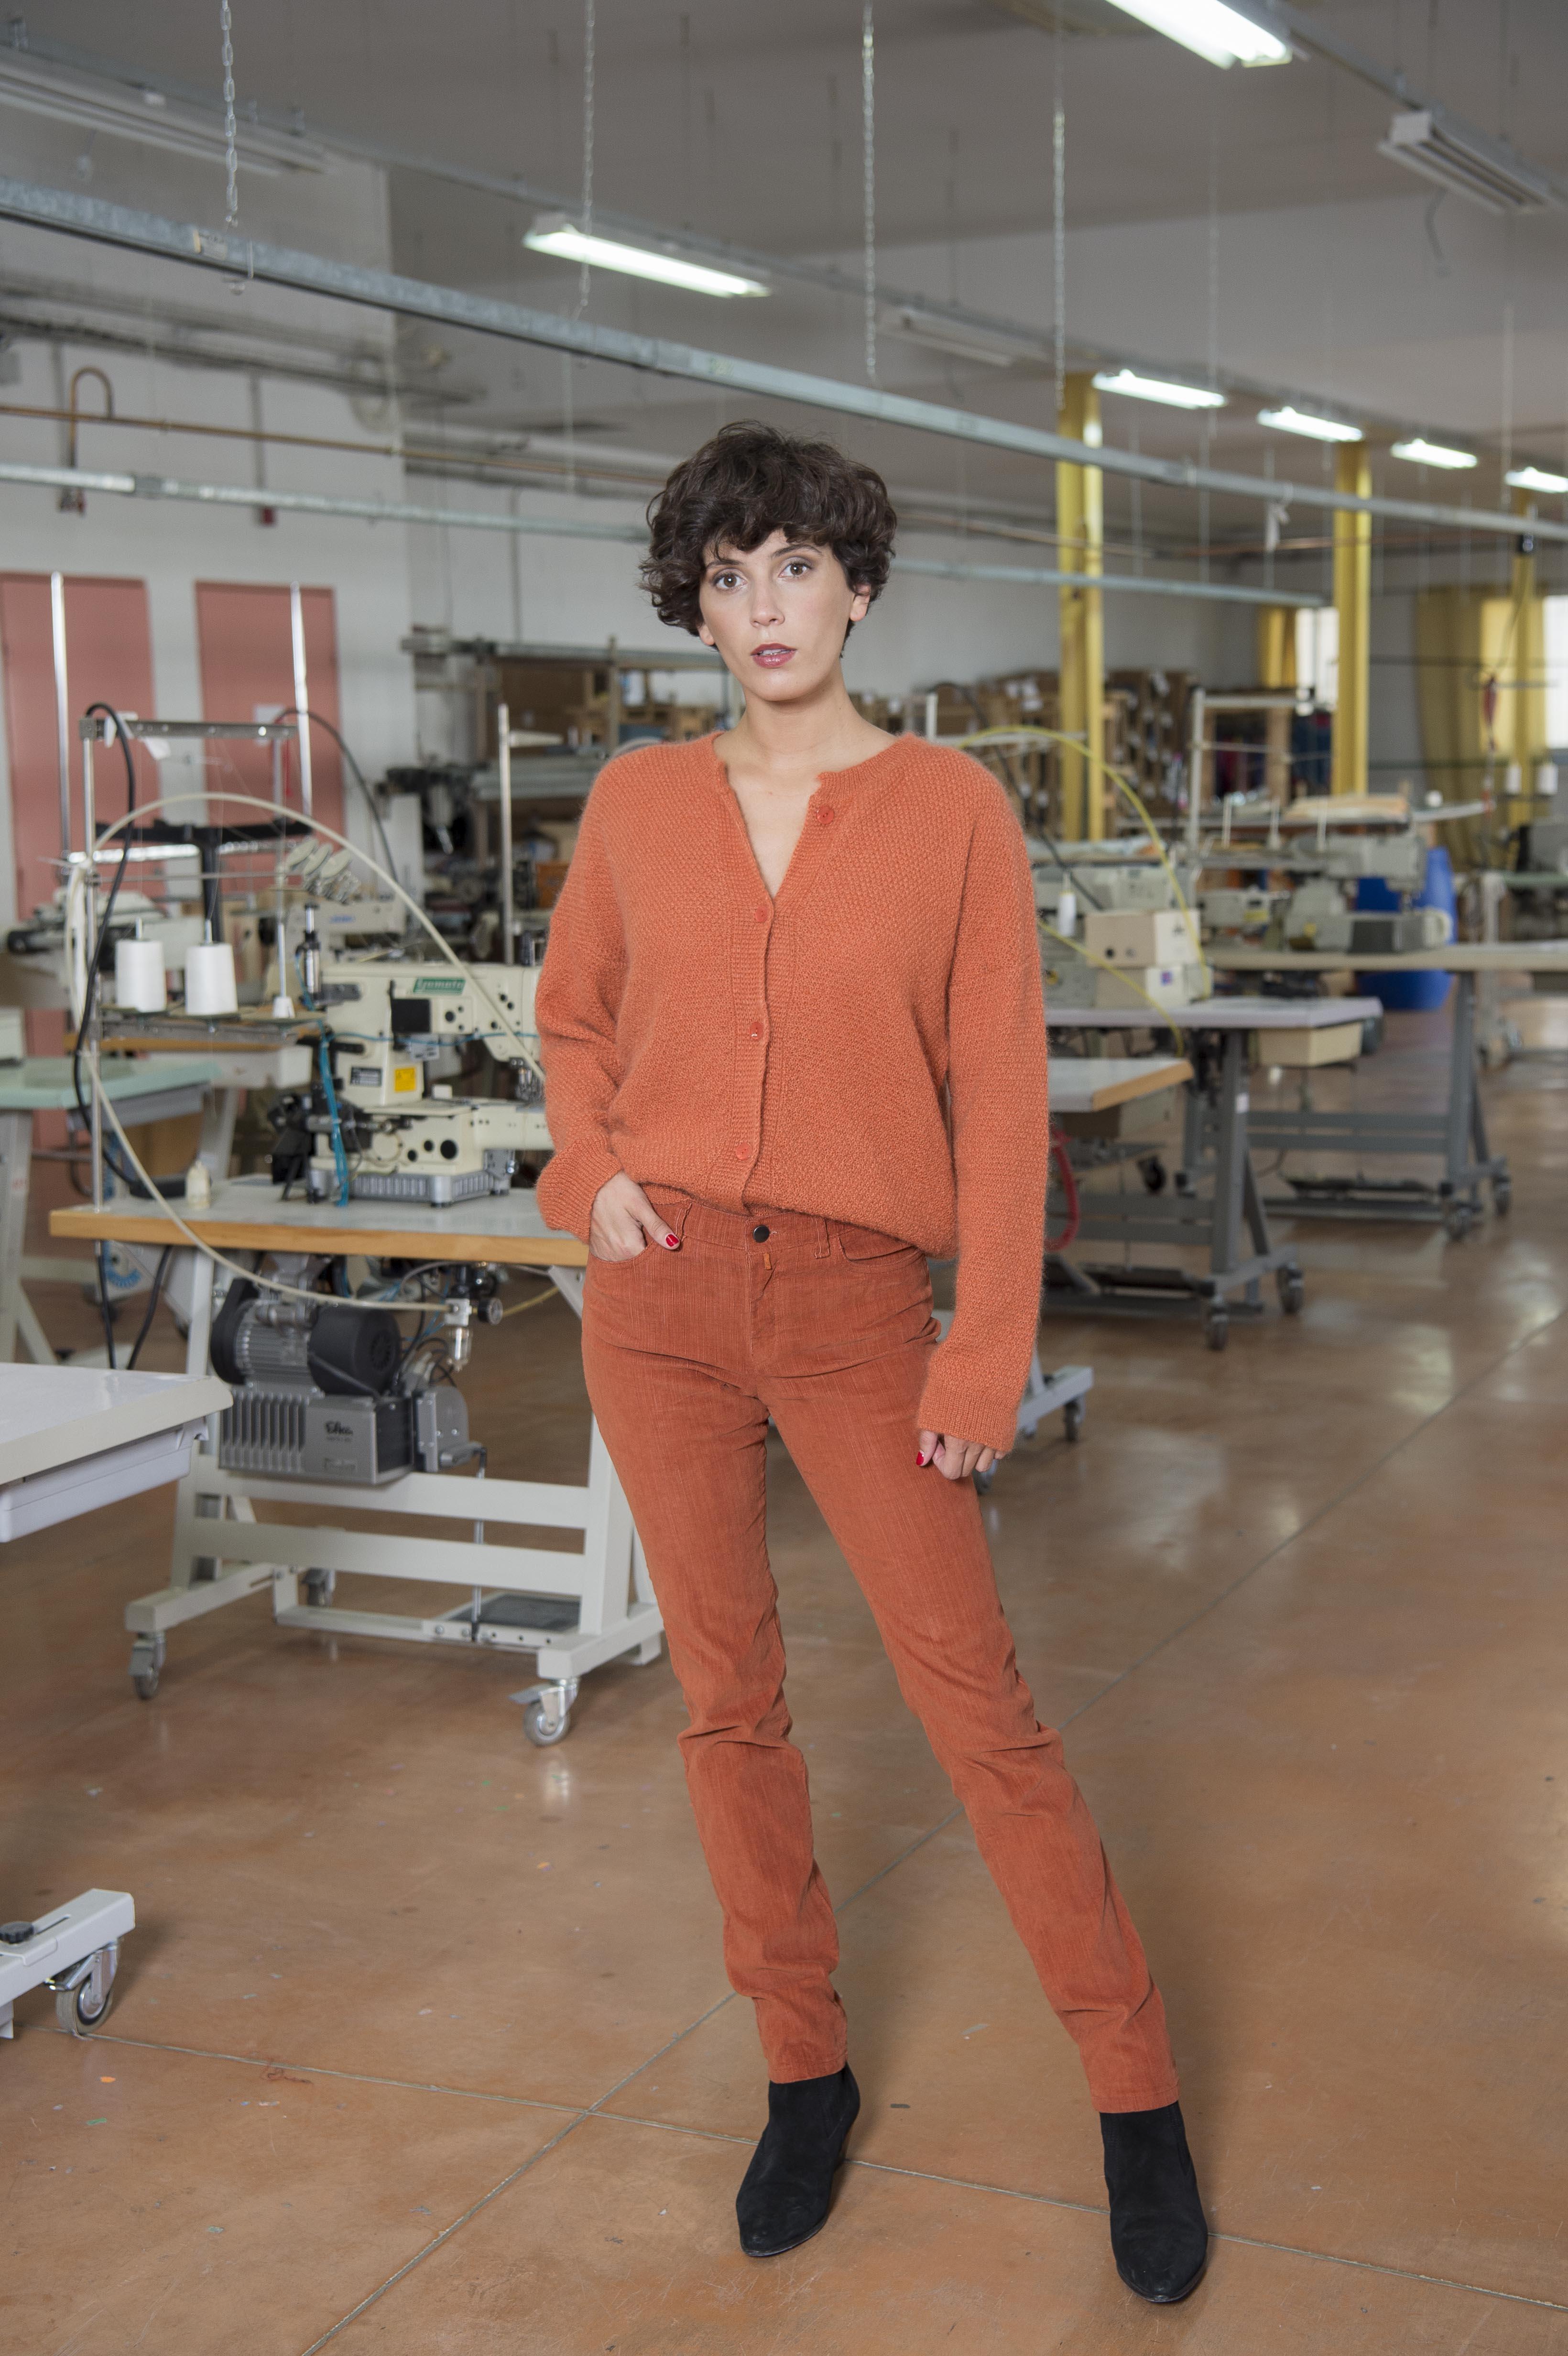 Pantalon Velours côtelé « flammé » stretch 82% COTON 18% ELASTOMULTIESTER